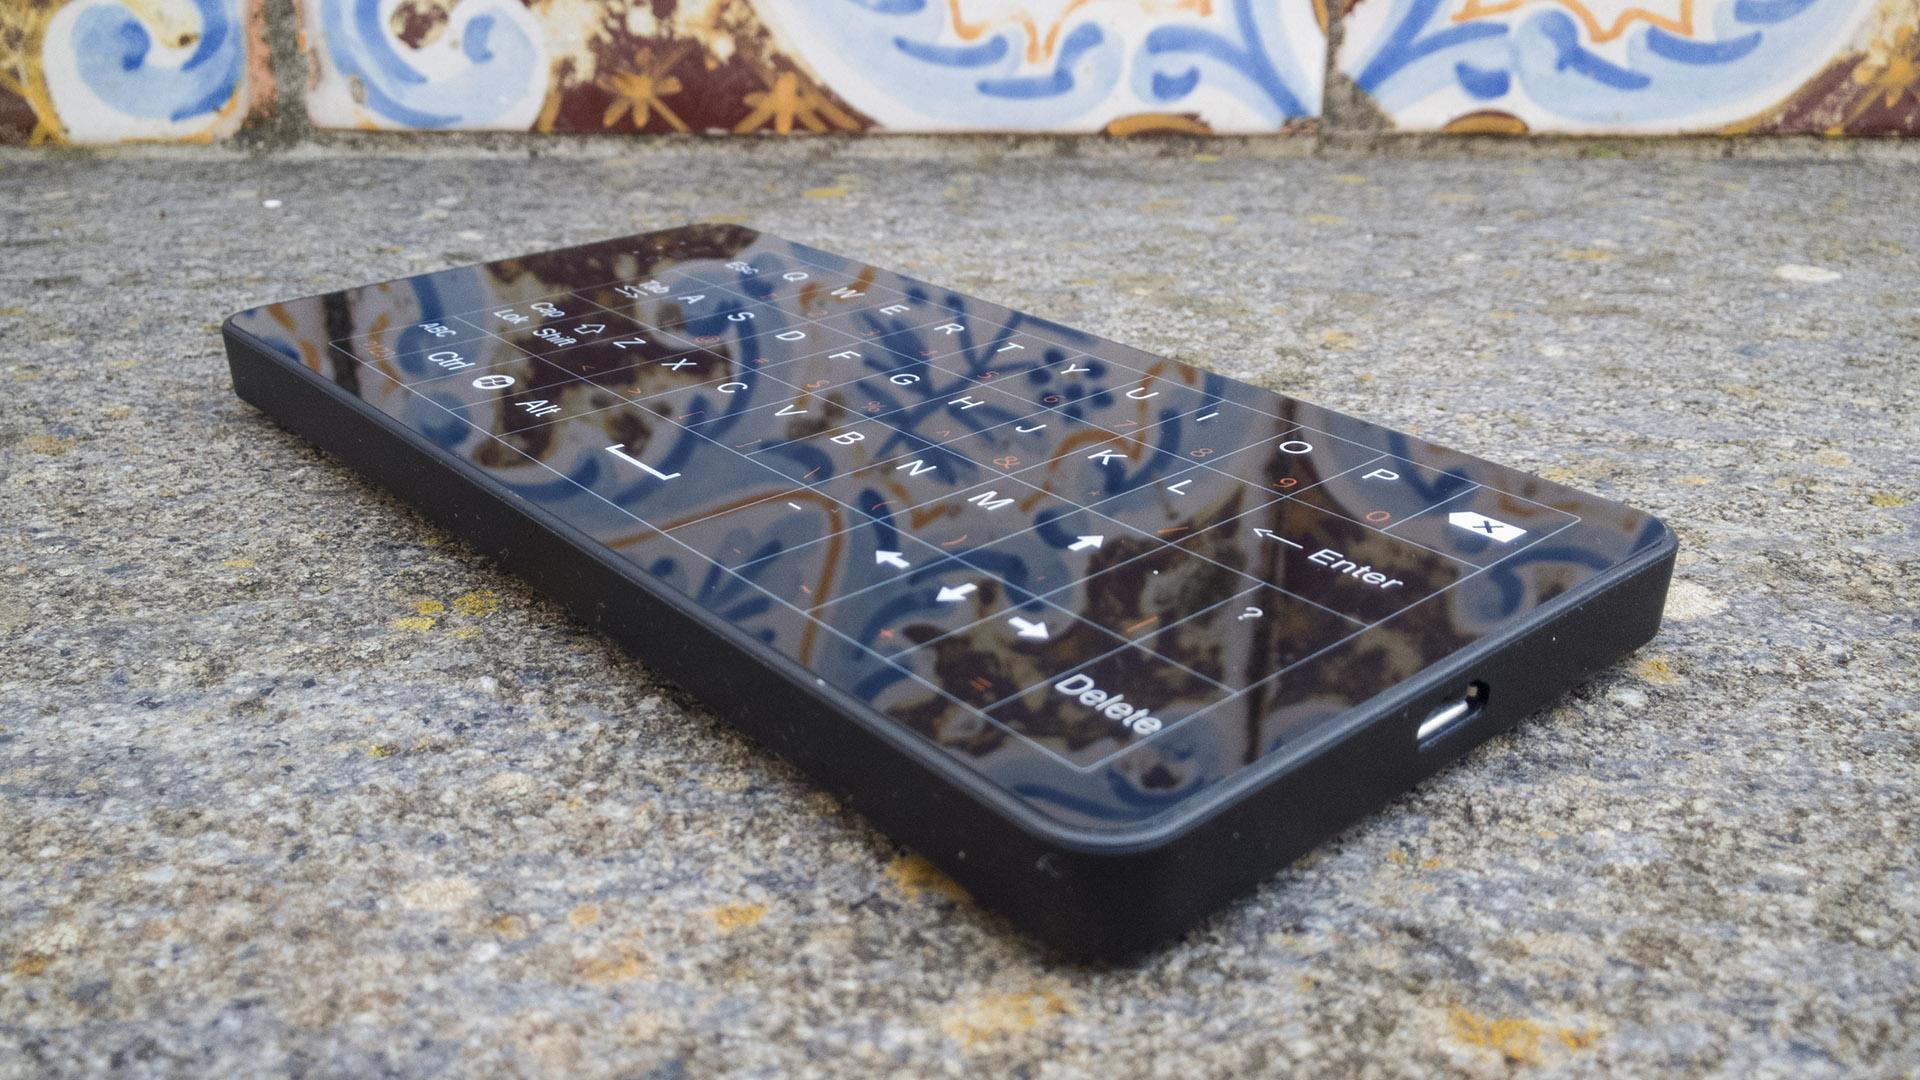 Beelink W8 Touch Keyboard Mouse (4)